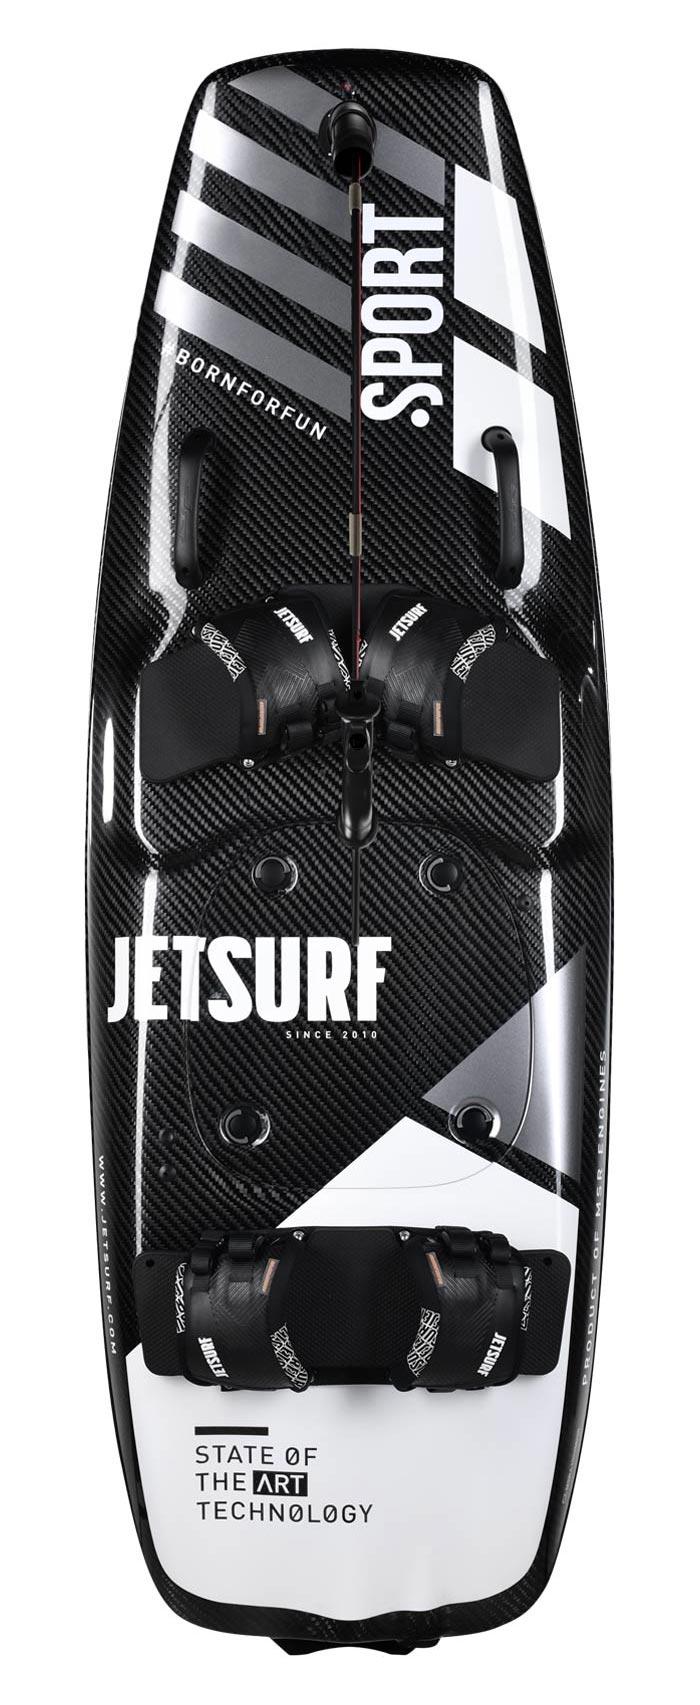 jetsurf_sport2020_white